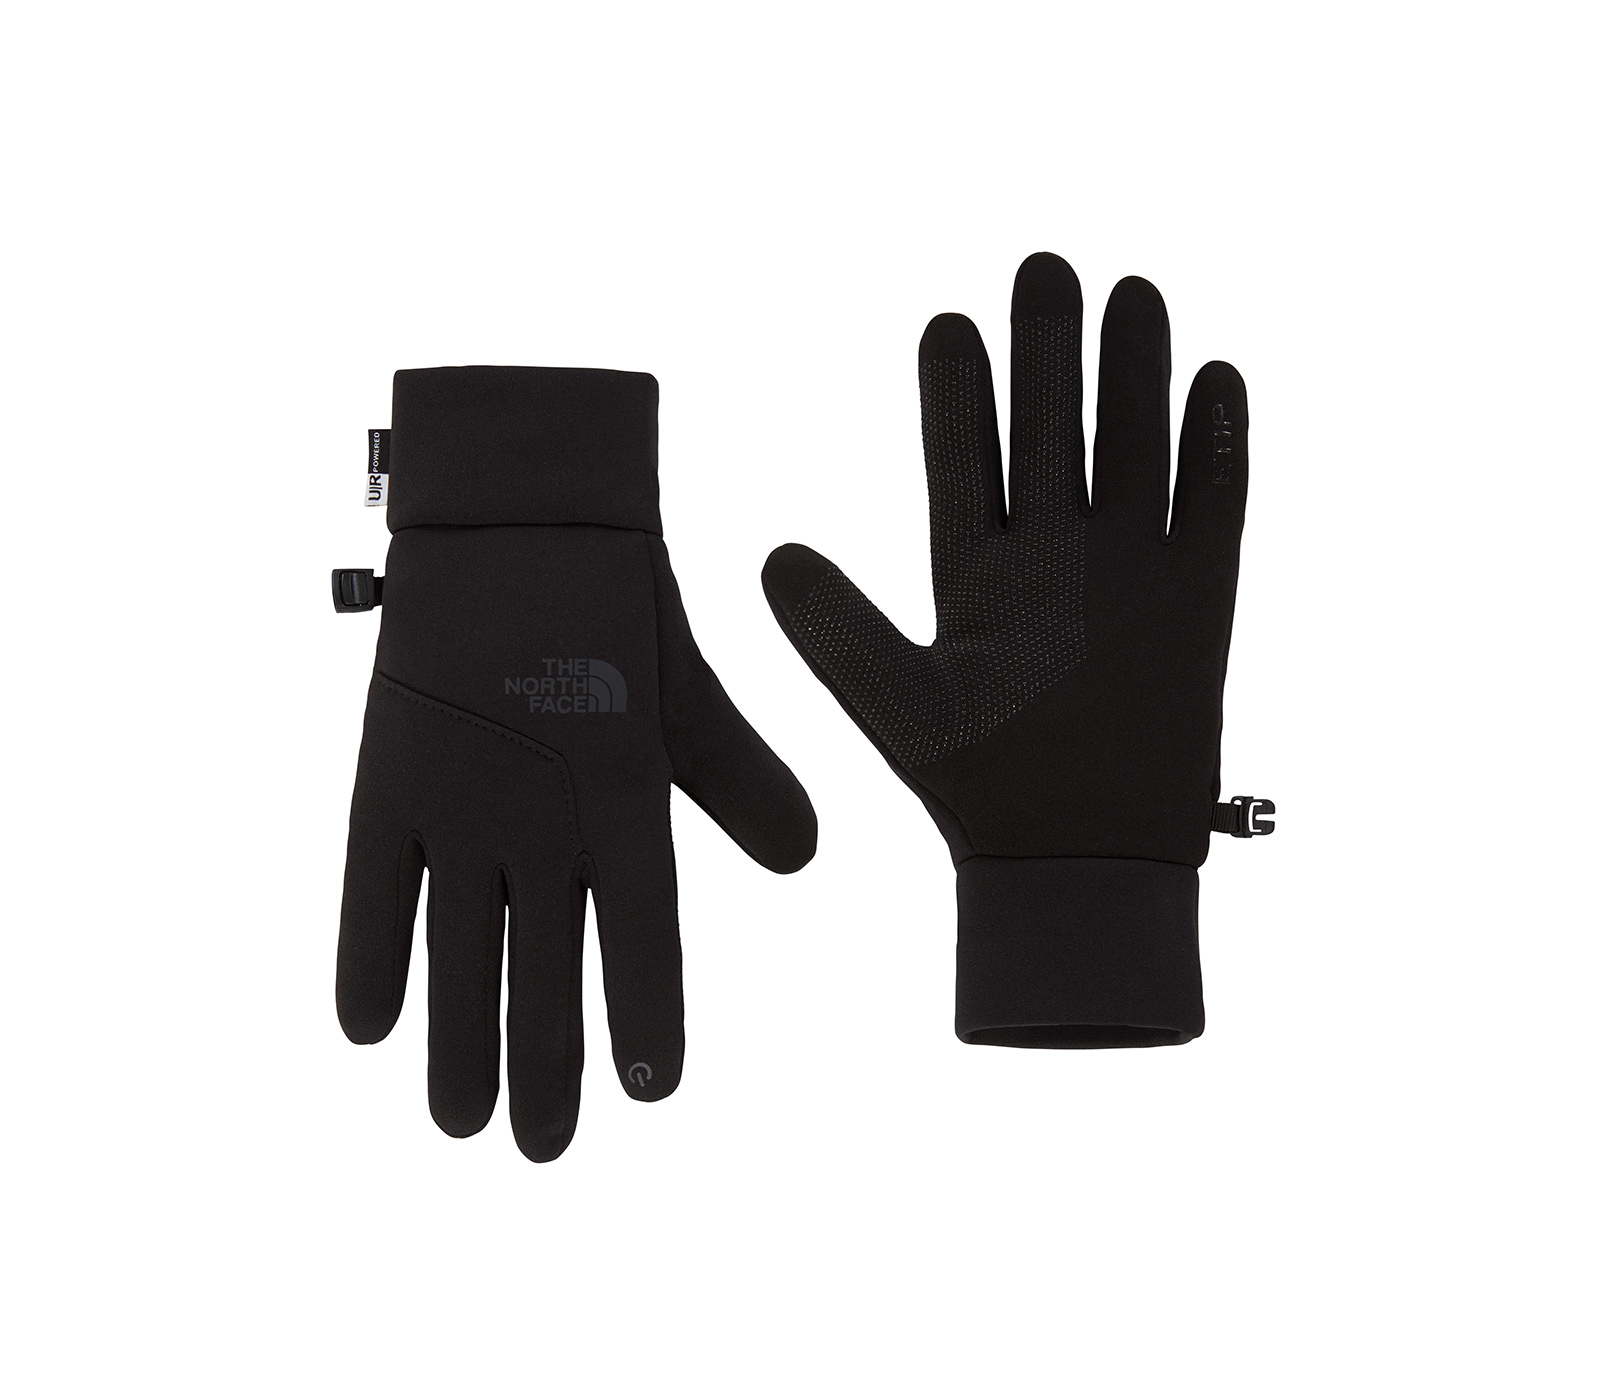 The North Face E-tip Handschoenen Heren